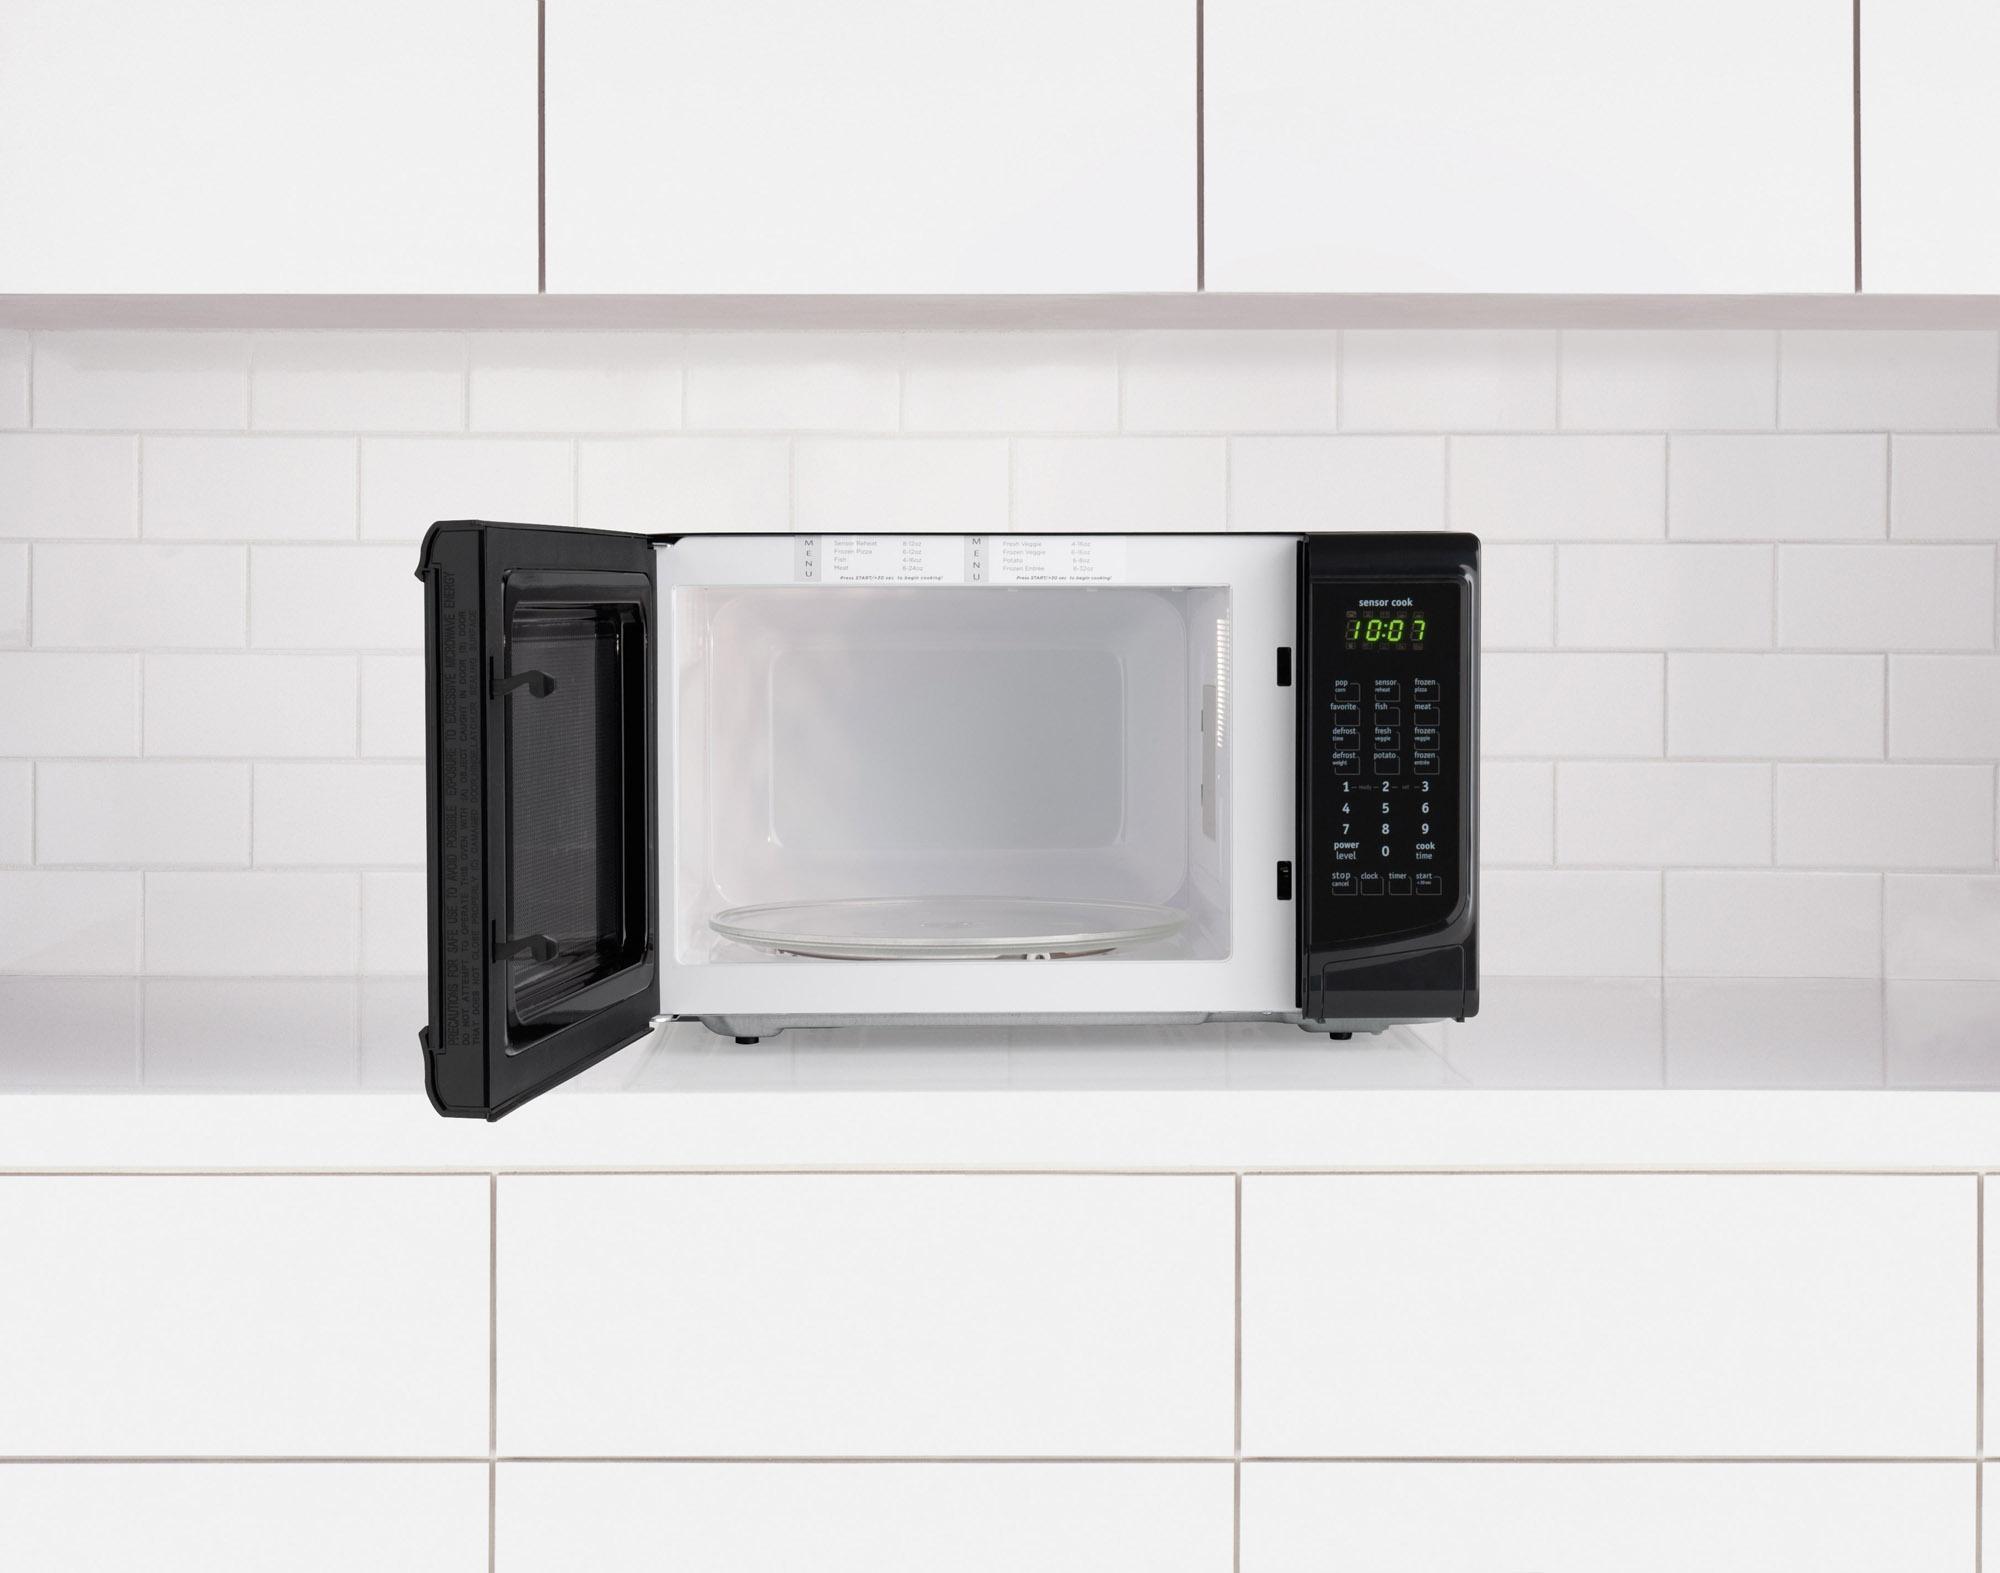 Frigidaire Countertop Stove Parts : FFCE1439LB Frigidaire ffce1439lb Countertop Microwaves Black